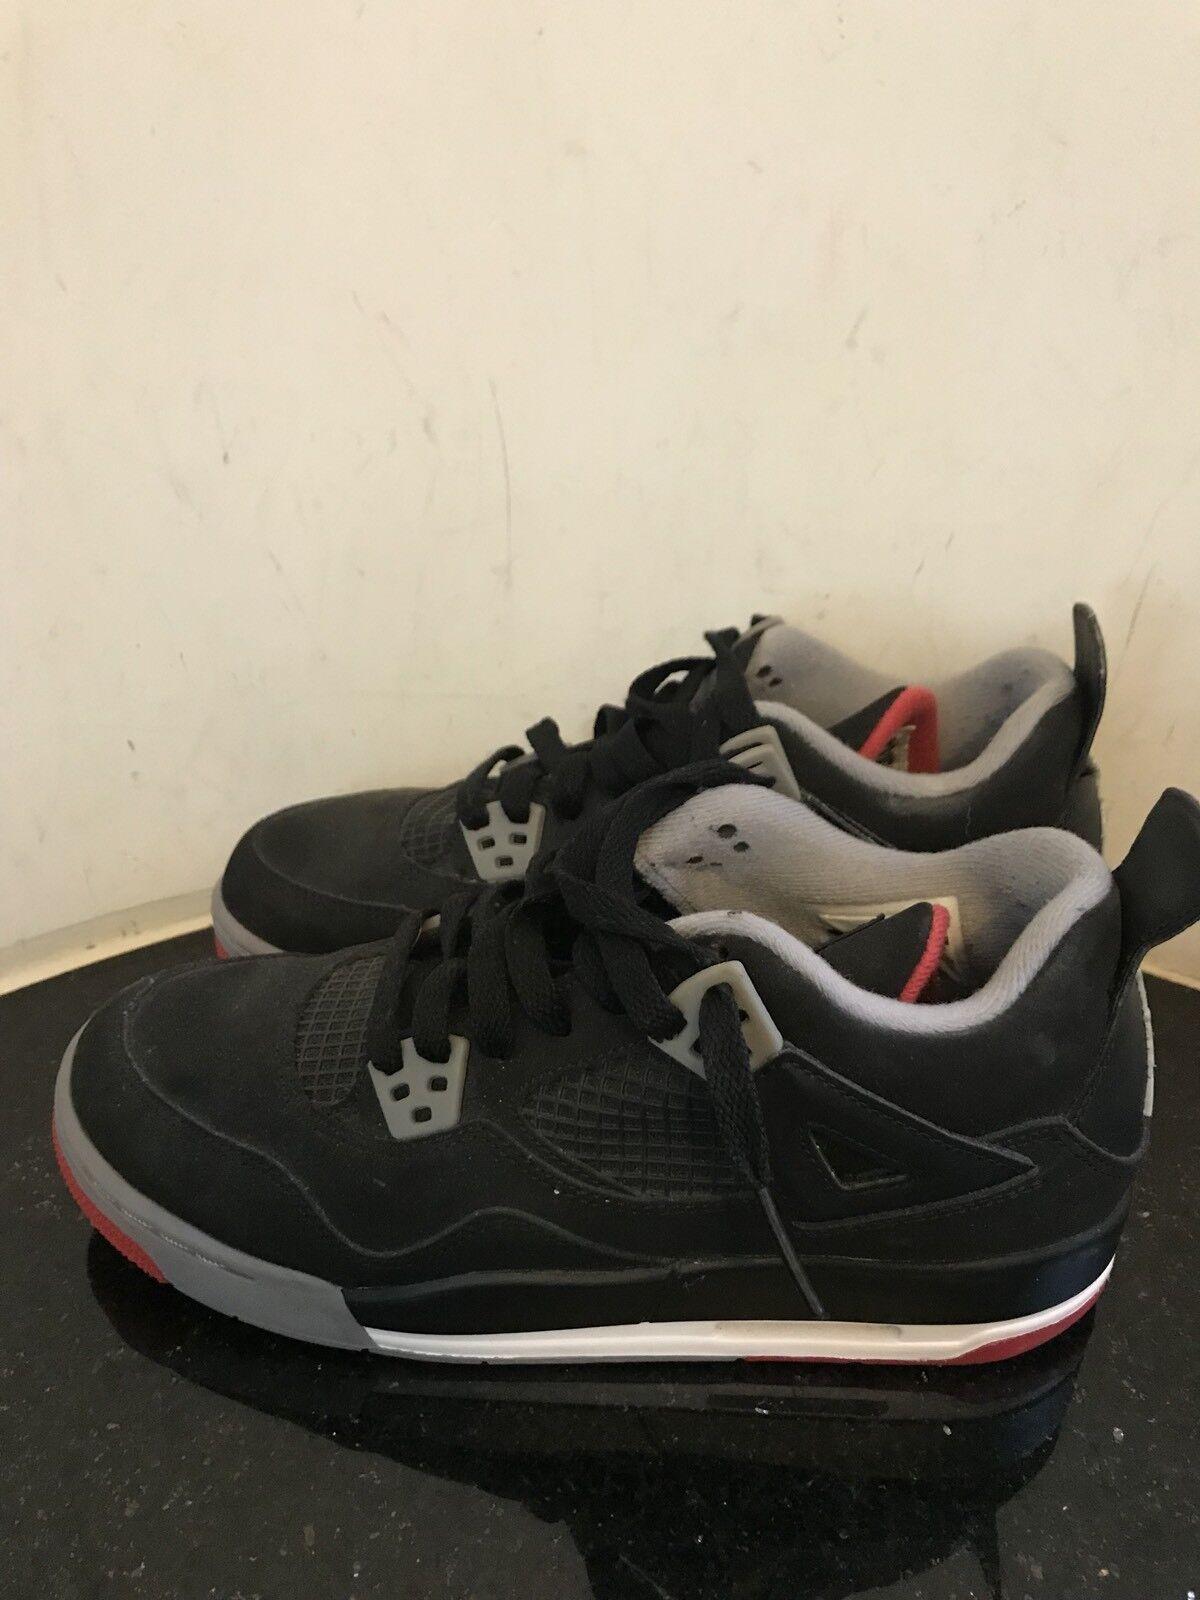 2012 Nike Air Jordan 4 IV Retro (308497 089) Bred Black Red Size 5.5 Youth